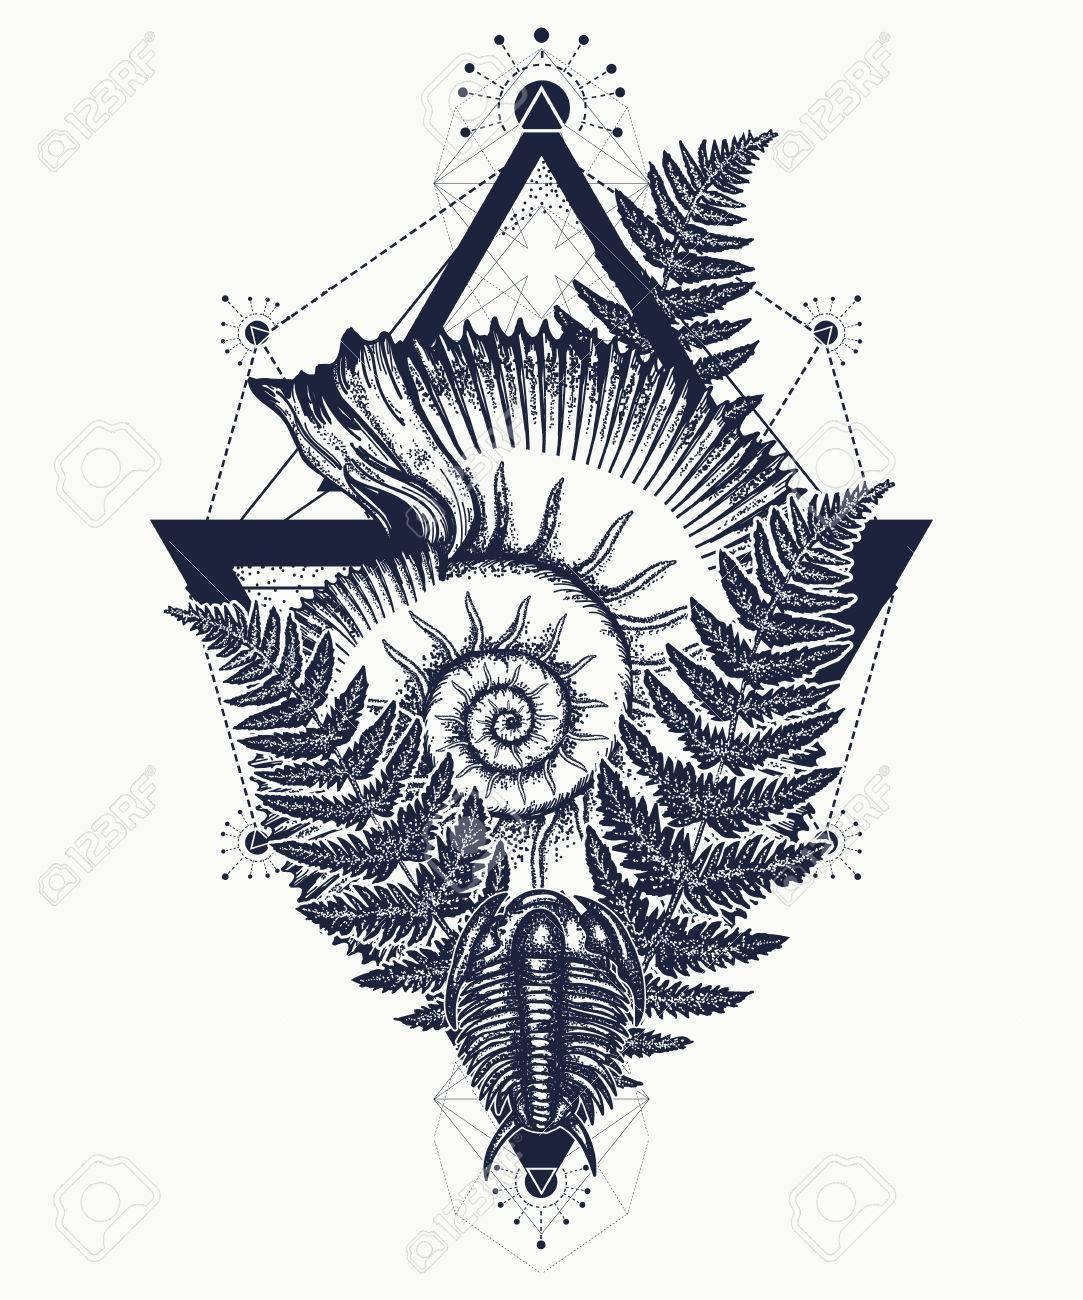 Ammonite Tattoo : ammonite, tattoo, Nautilus, Shell, Prehistoric, Tattoo, Ancient, Ammonite, The.., Royalty, Cliparts,, Vectors,, Stock, Illustration., Image, 75443841.